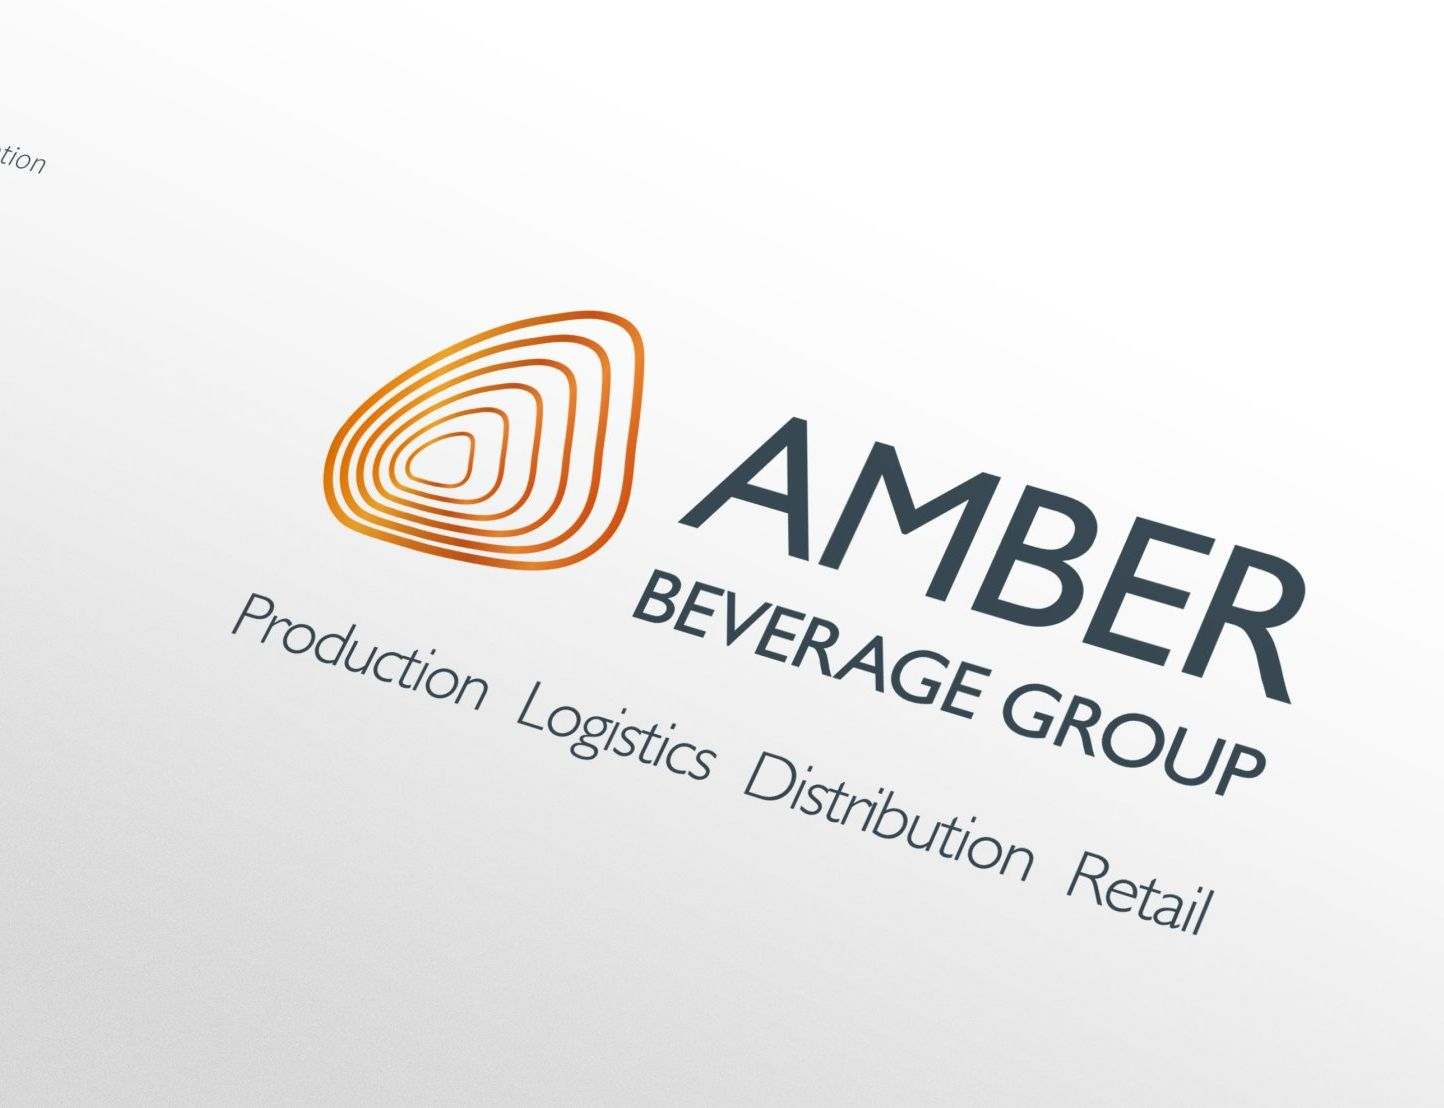 Amber Beverage Group